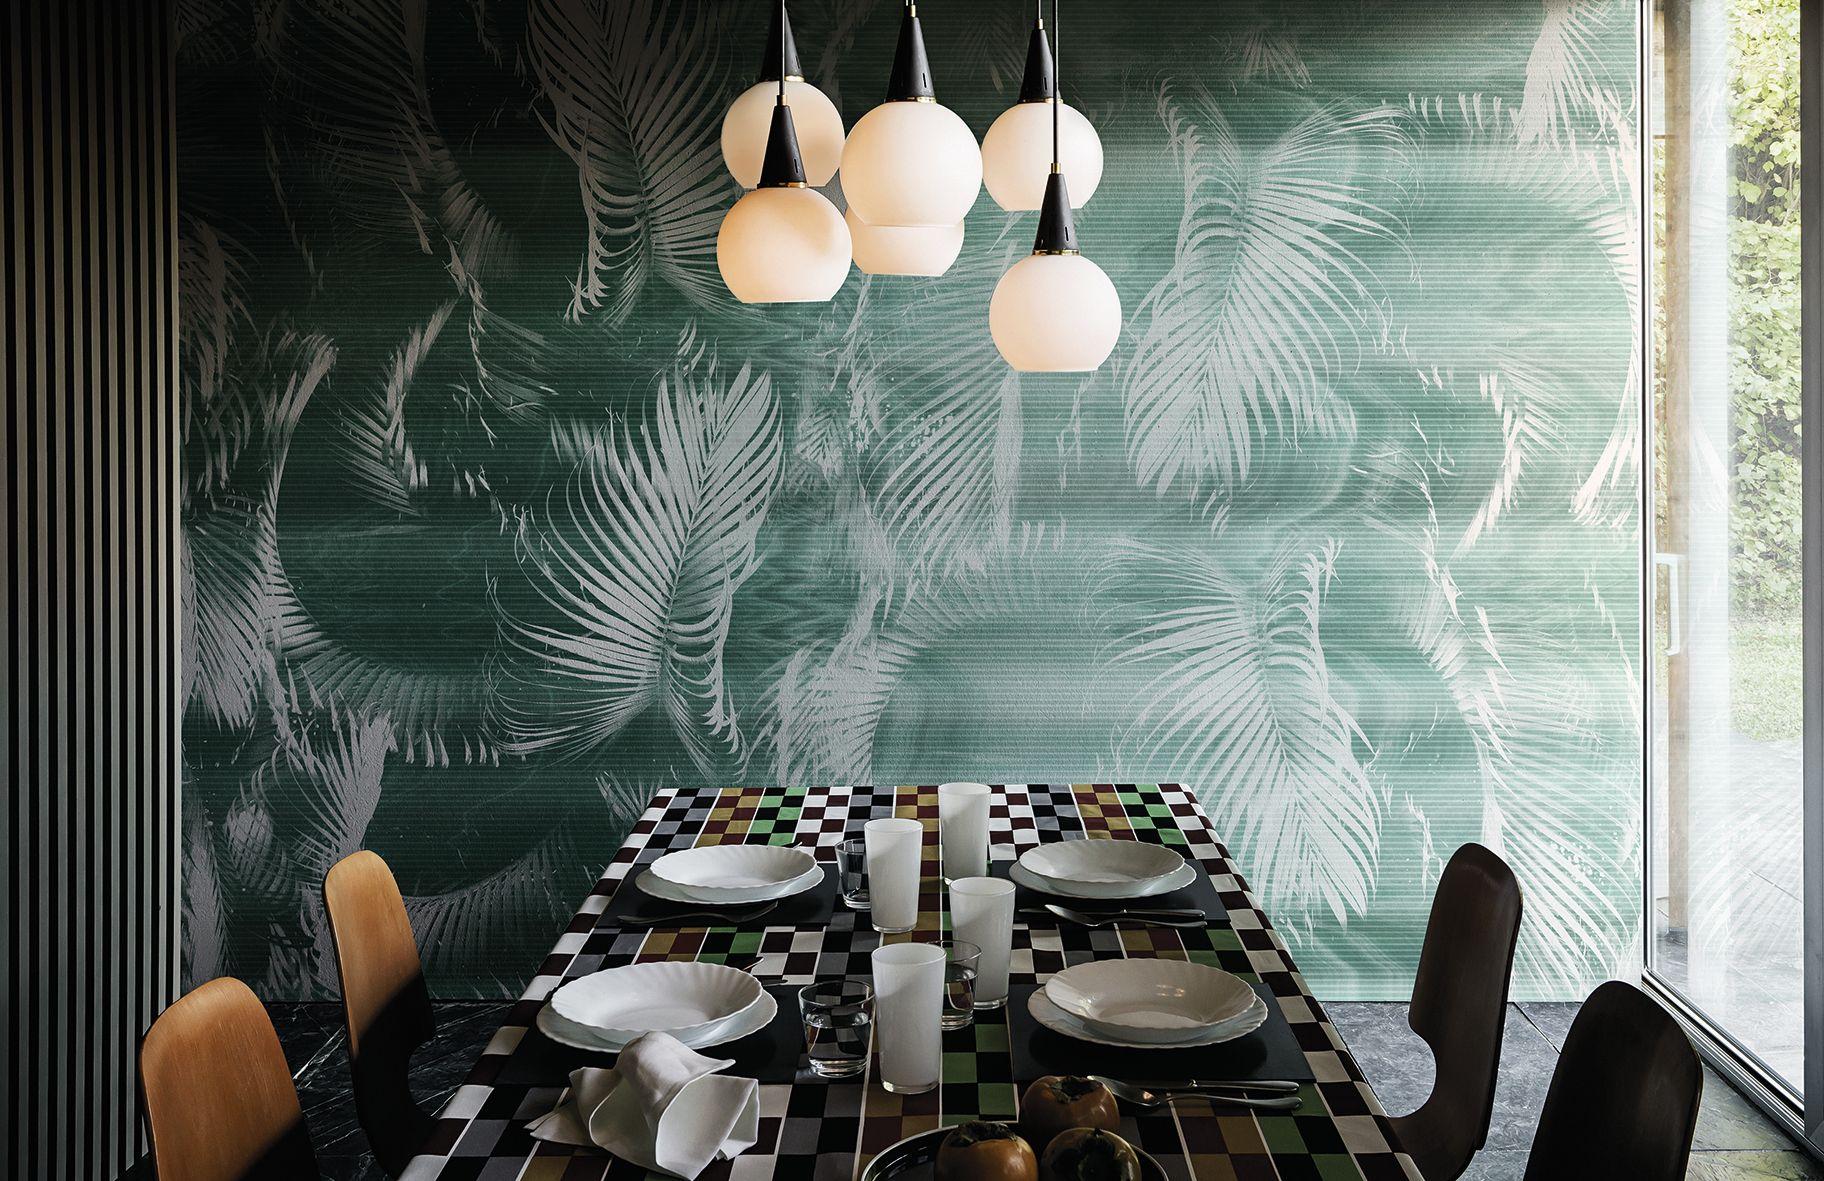 Via col vento wallanddeco wallpaper wallcovering